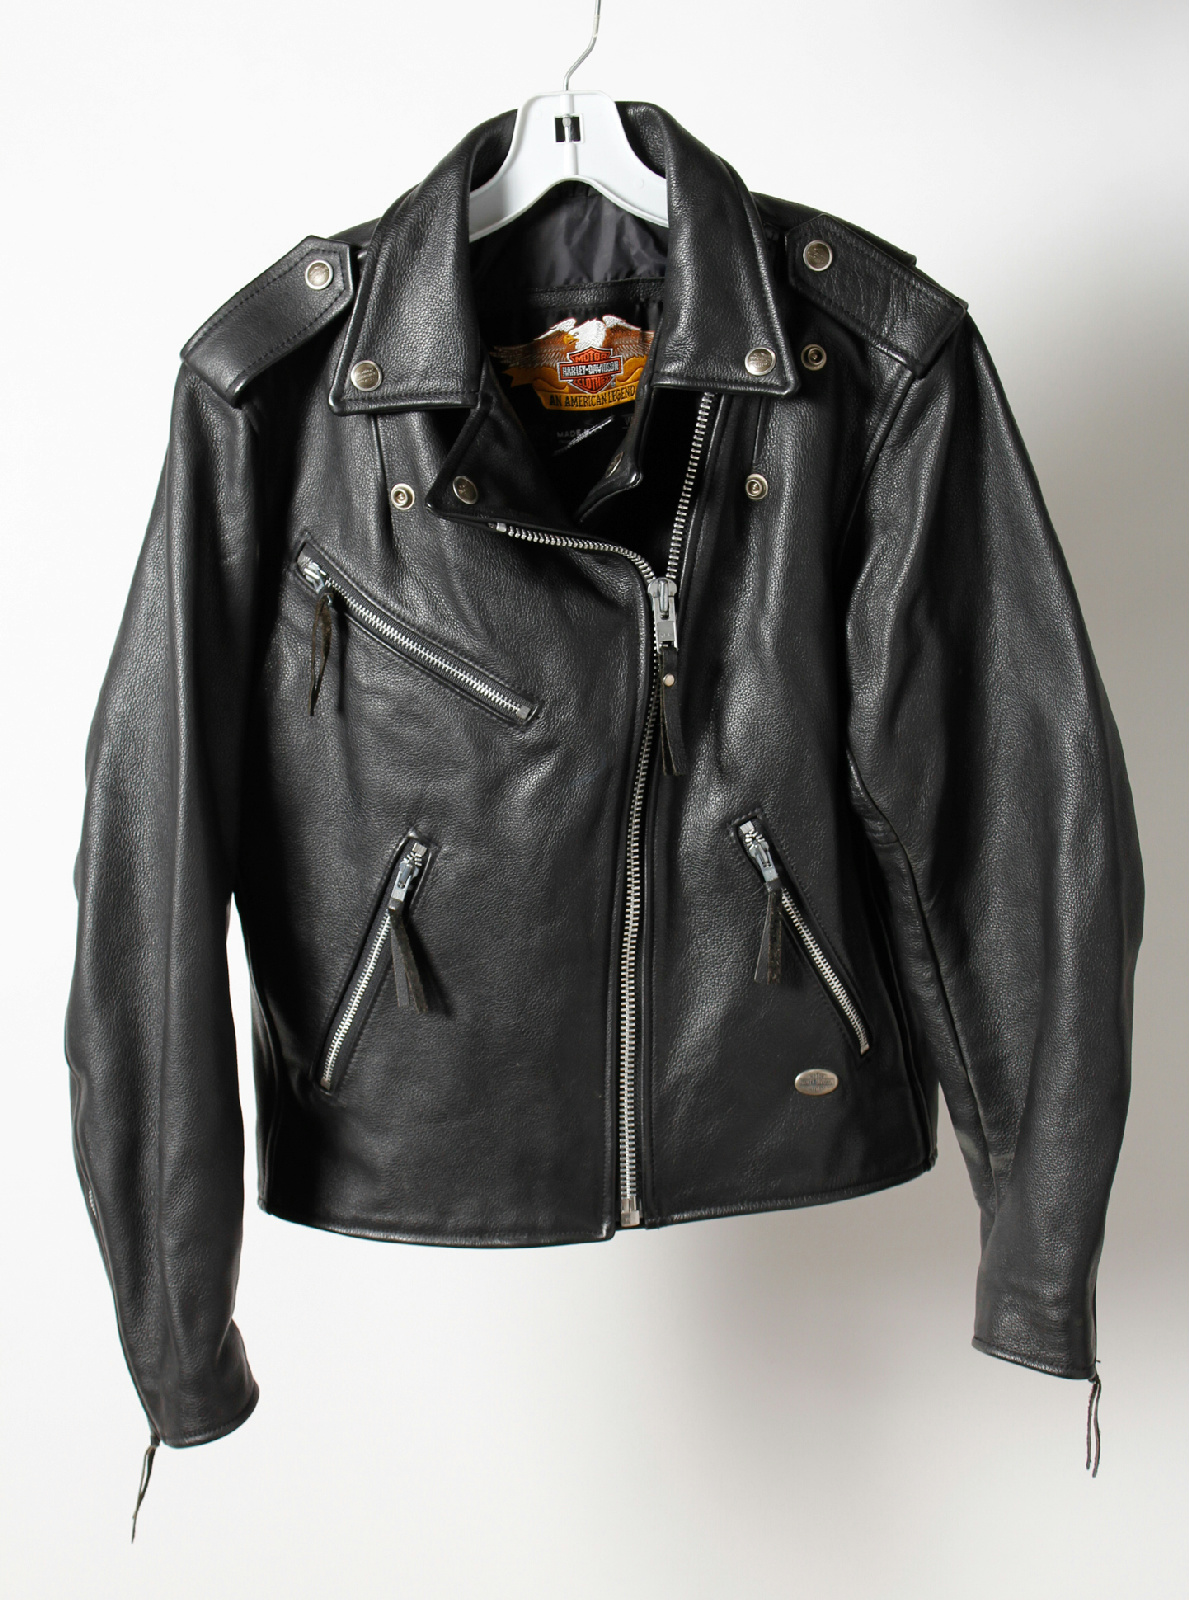 Leather jacket zippers